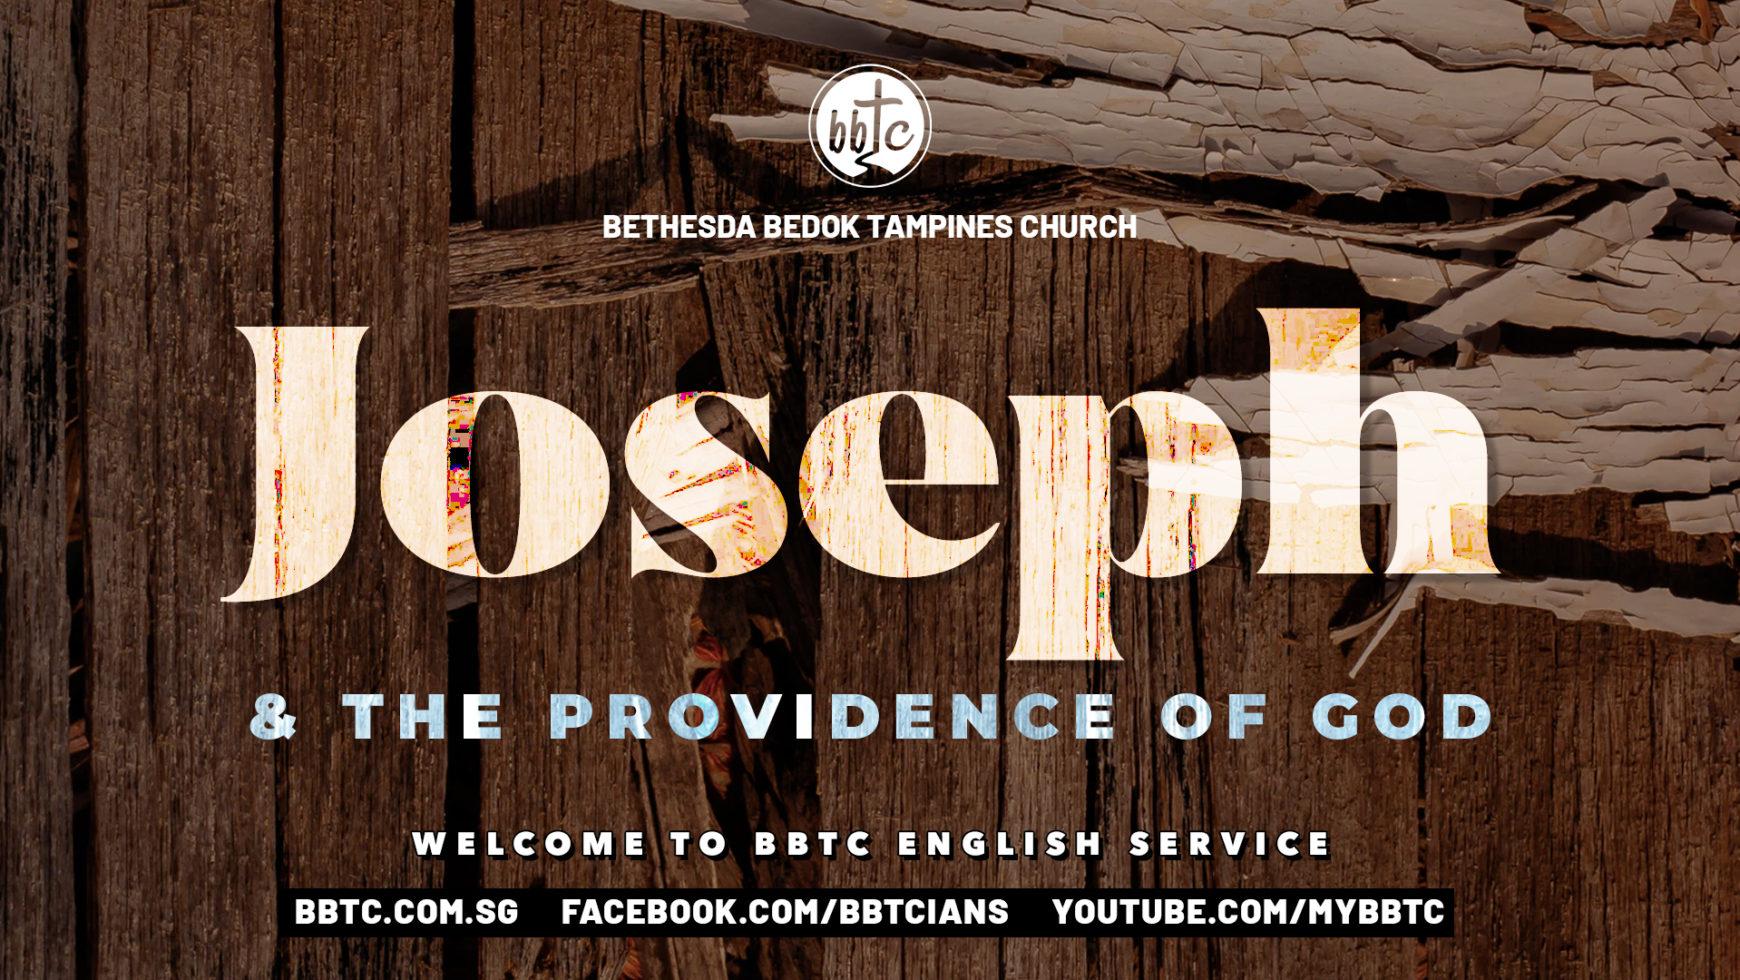 JOSEPH & THE PROVIDENCE OF GOD